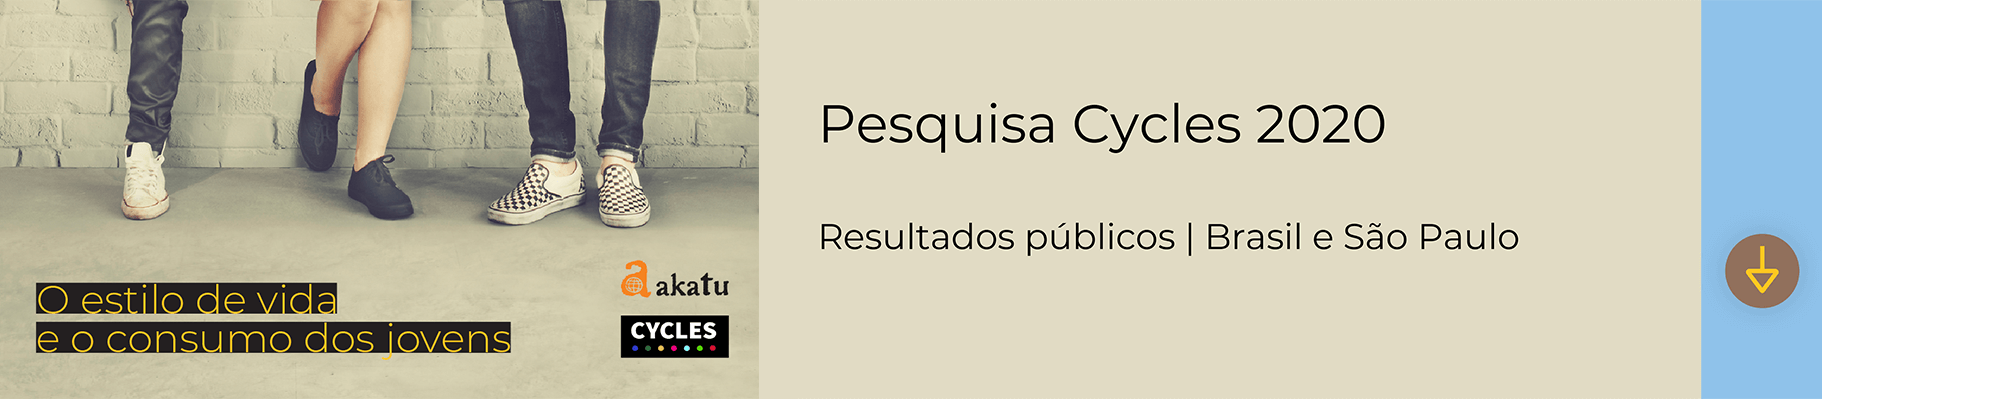 Pesquisa Cycles 2020